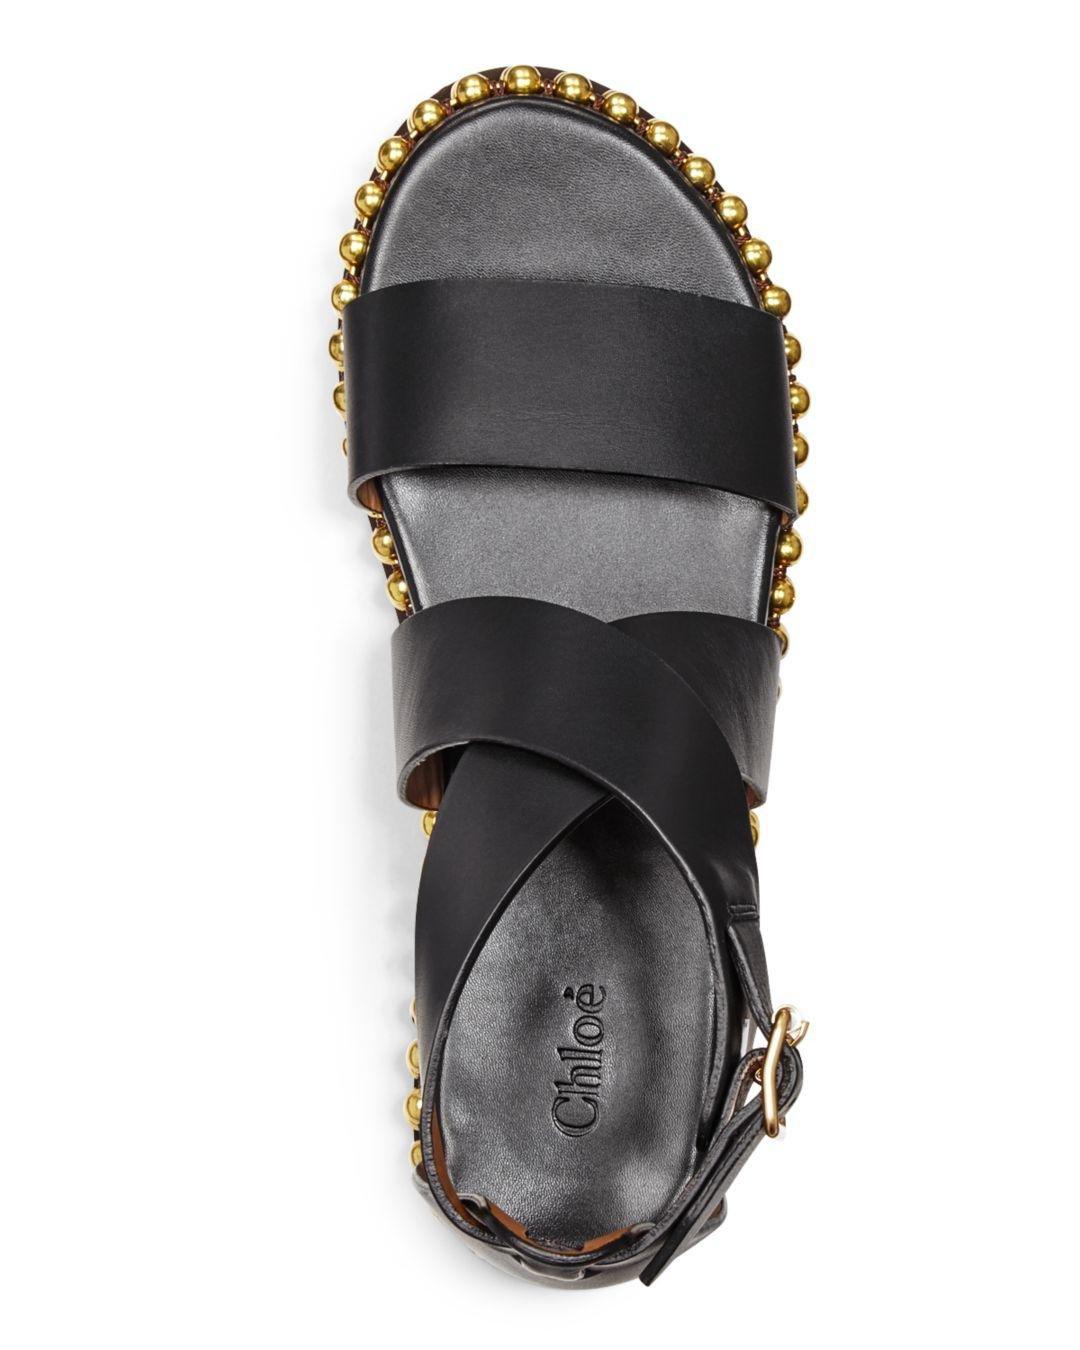 Sawyer Studded Leather Flatform Sandals